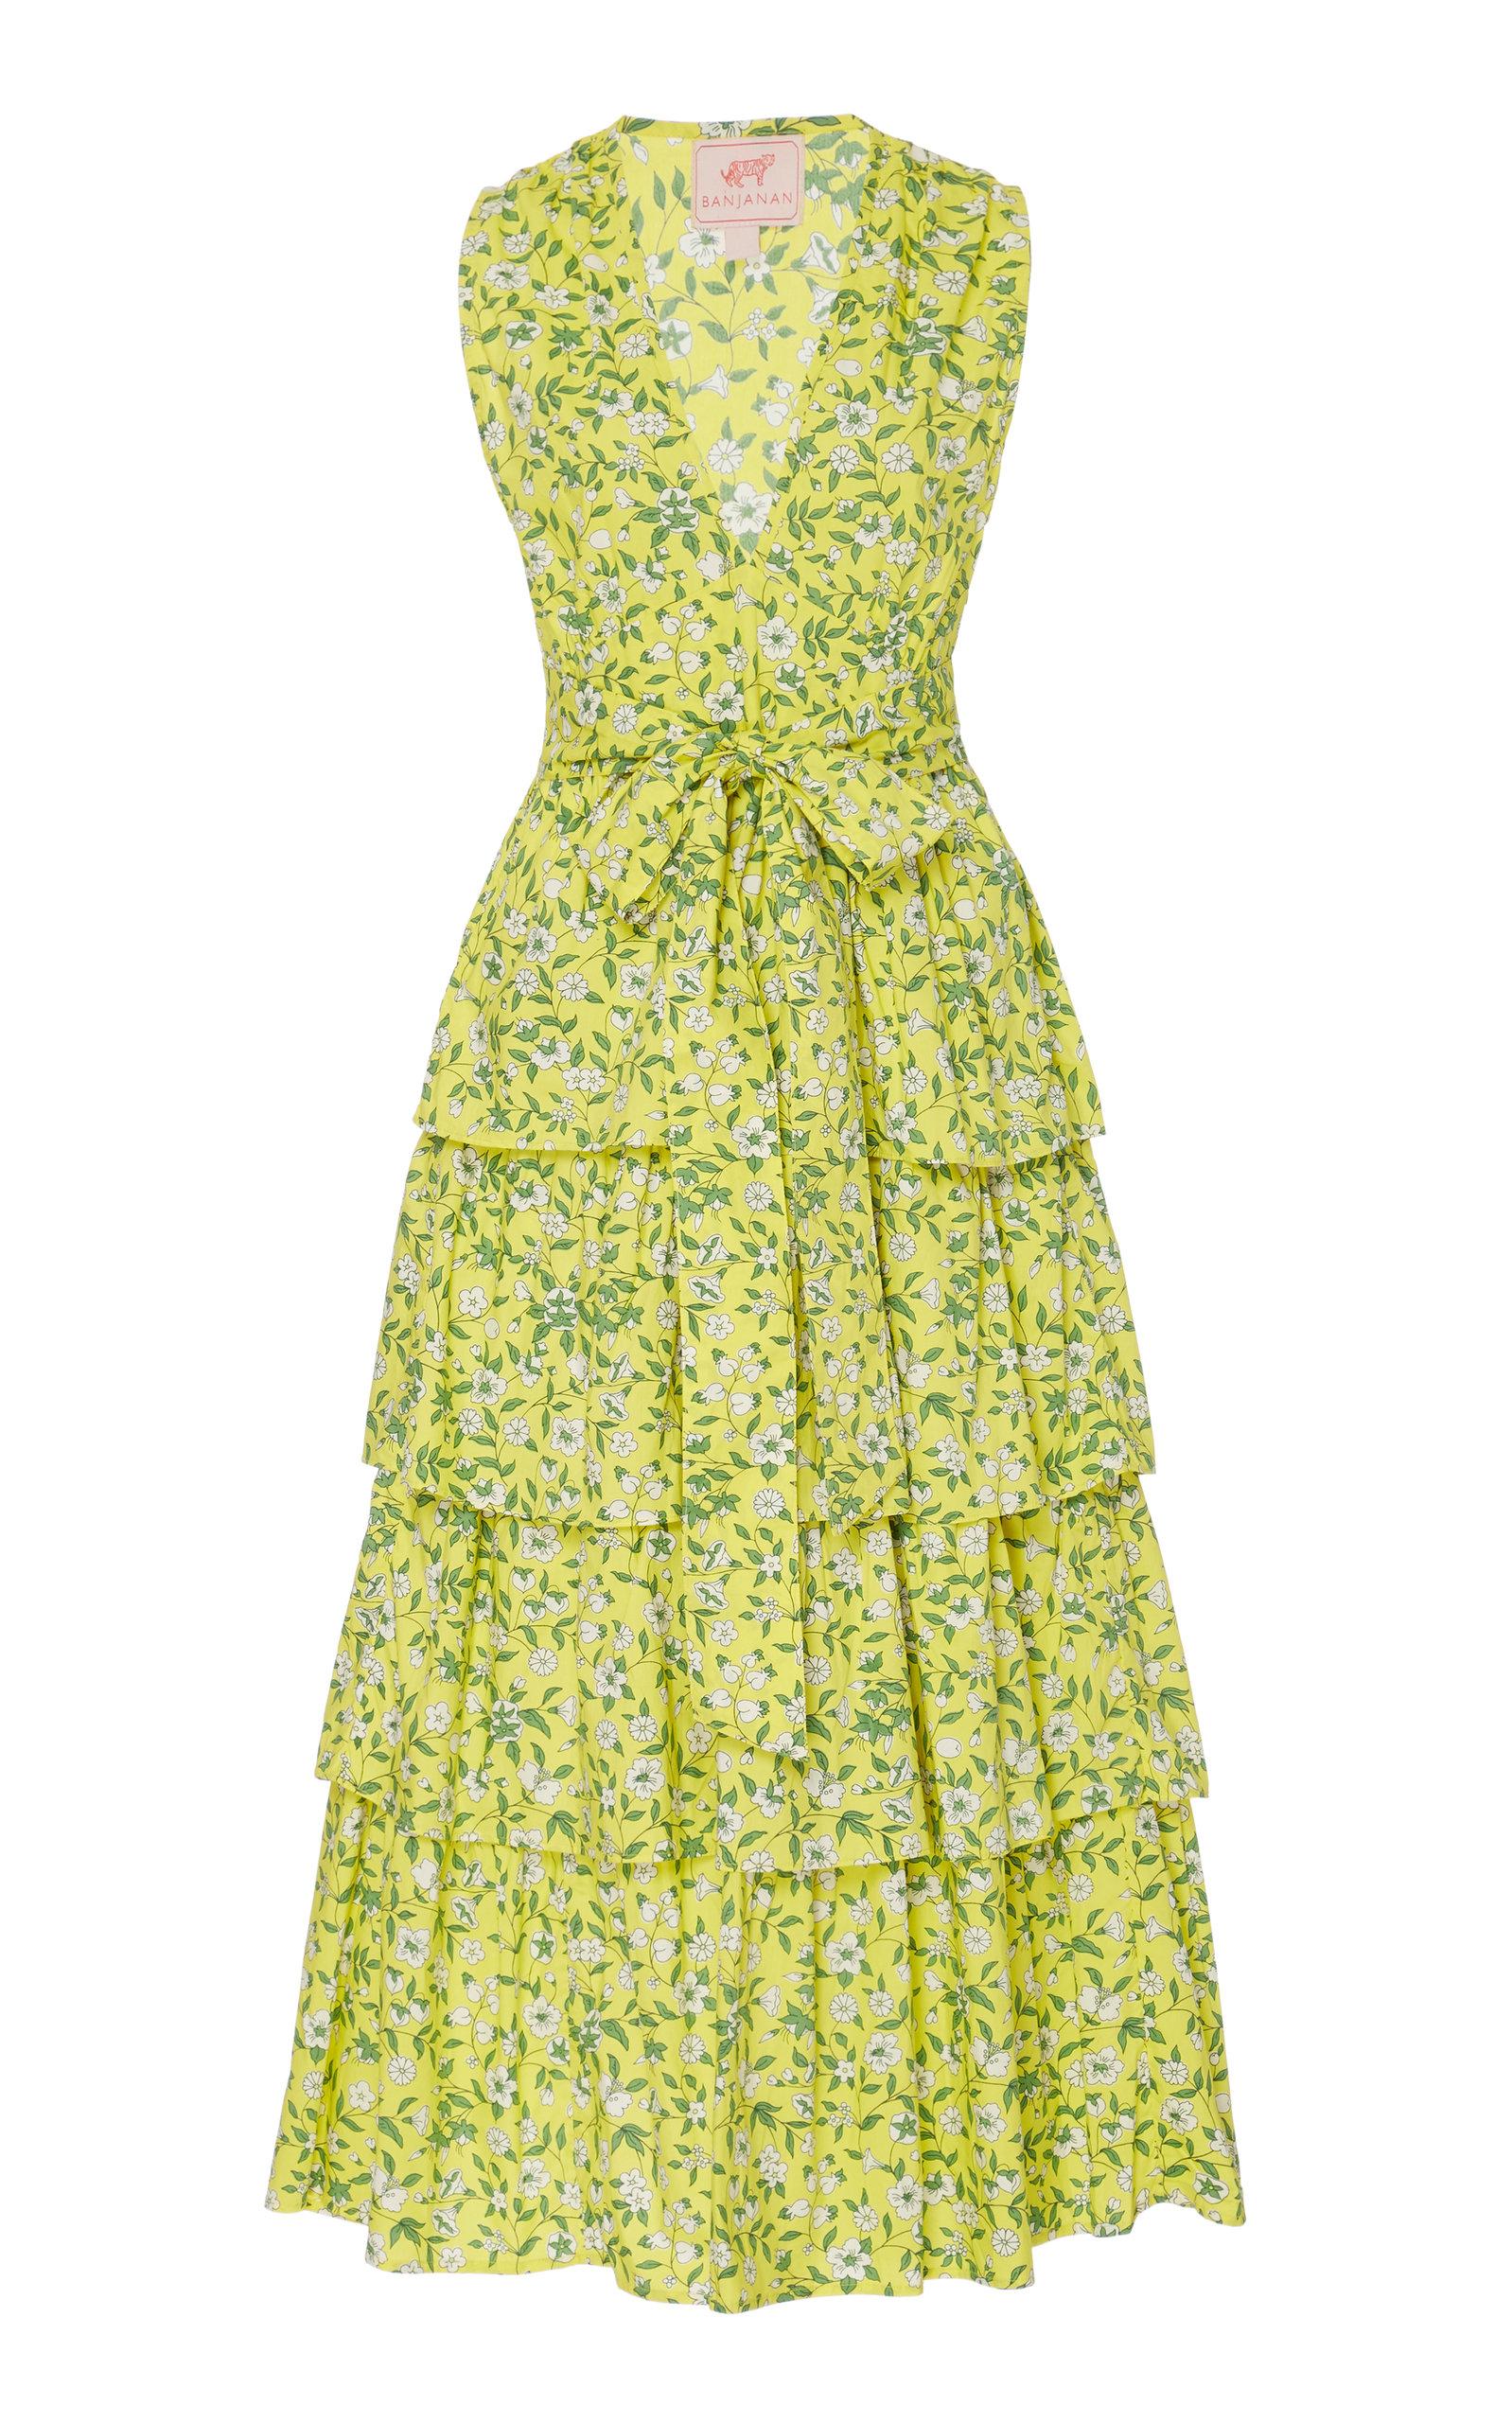 Buy Banjanan Eliza Ruffled Cotton Midi Dress online, shop Banjanan at the best price